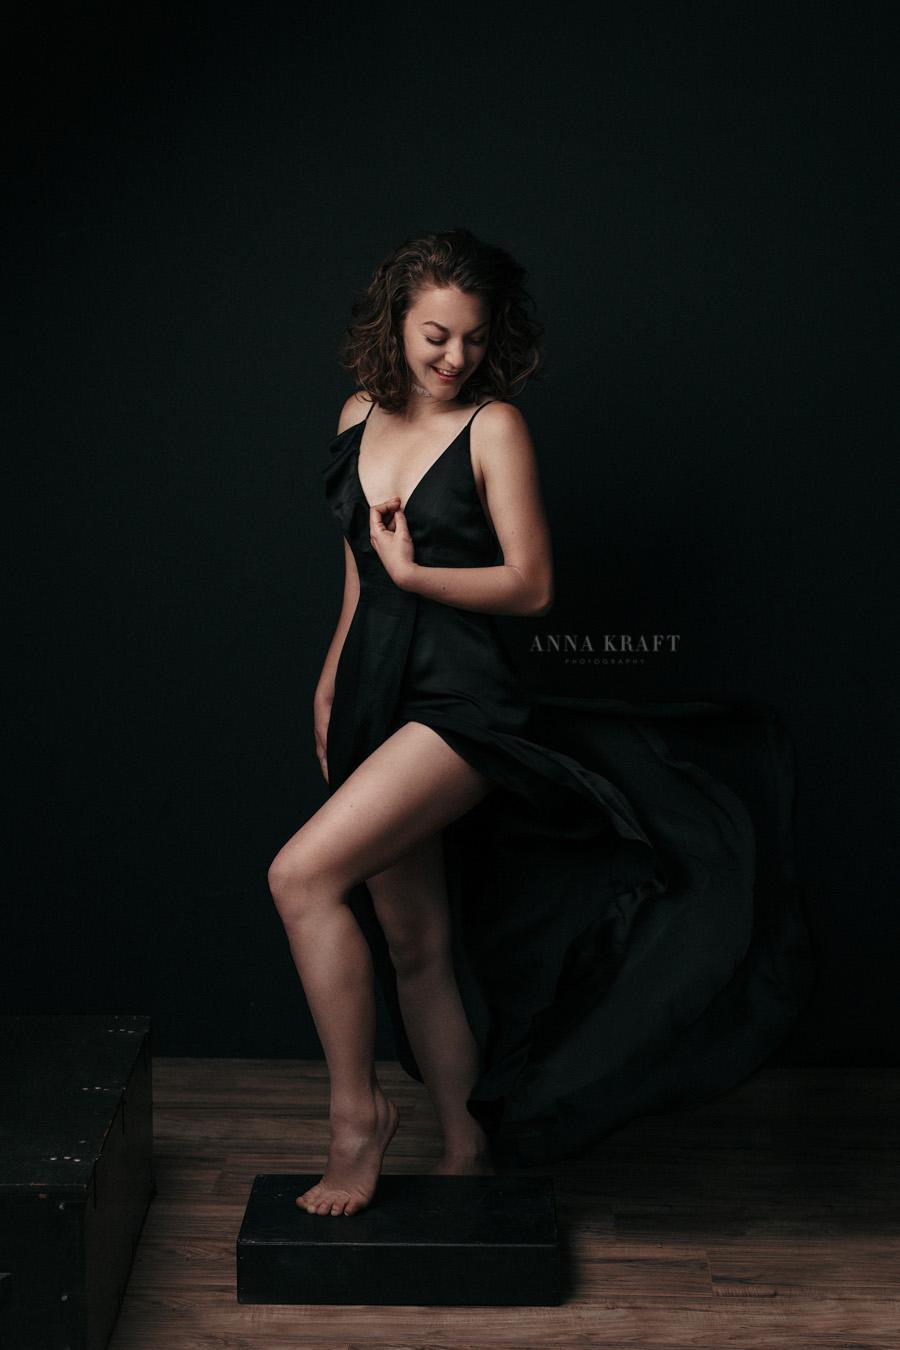 anna_kraft_photography_georgetown_square_studio_family_portrait-27.jpg